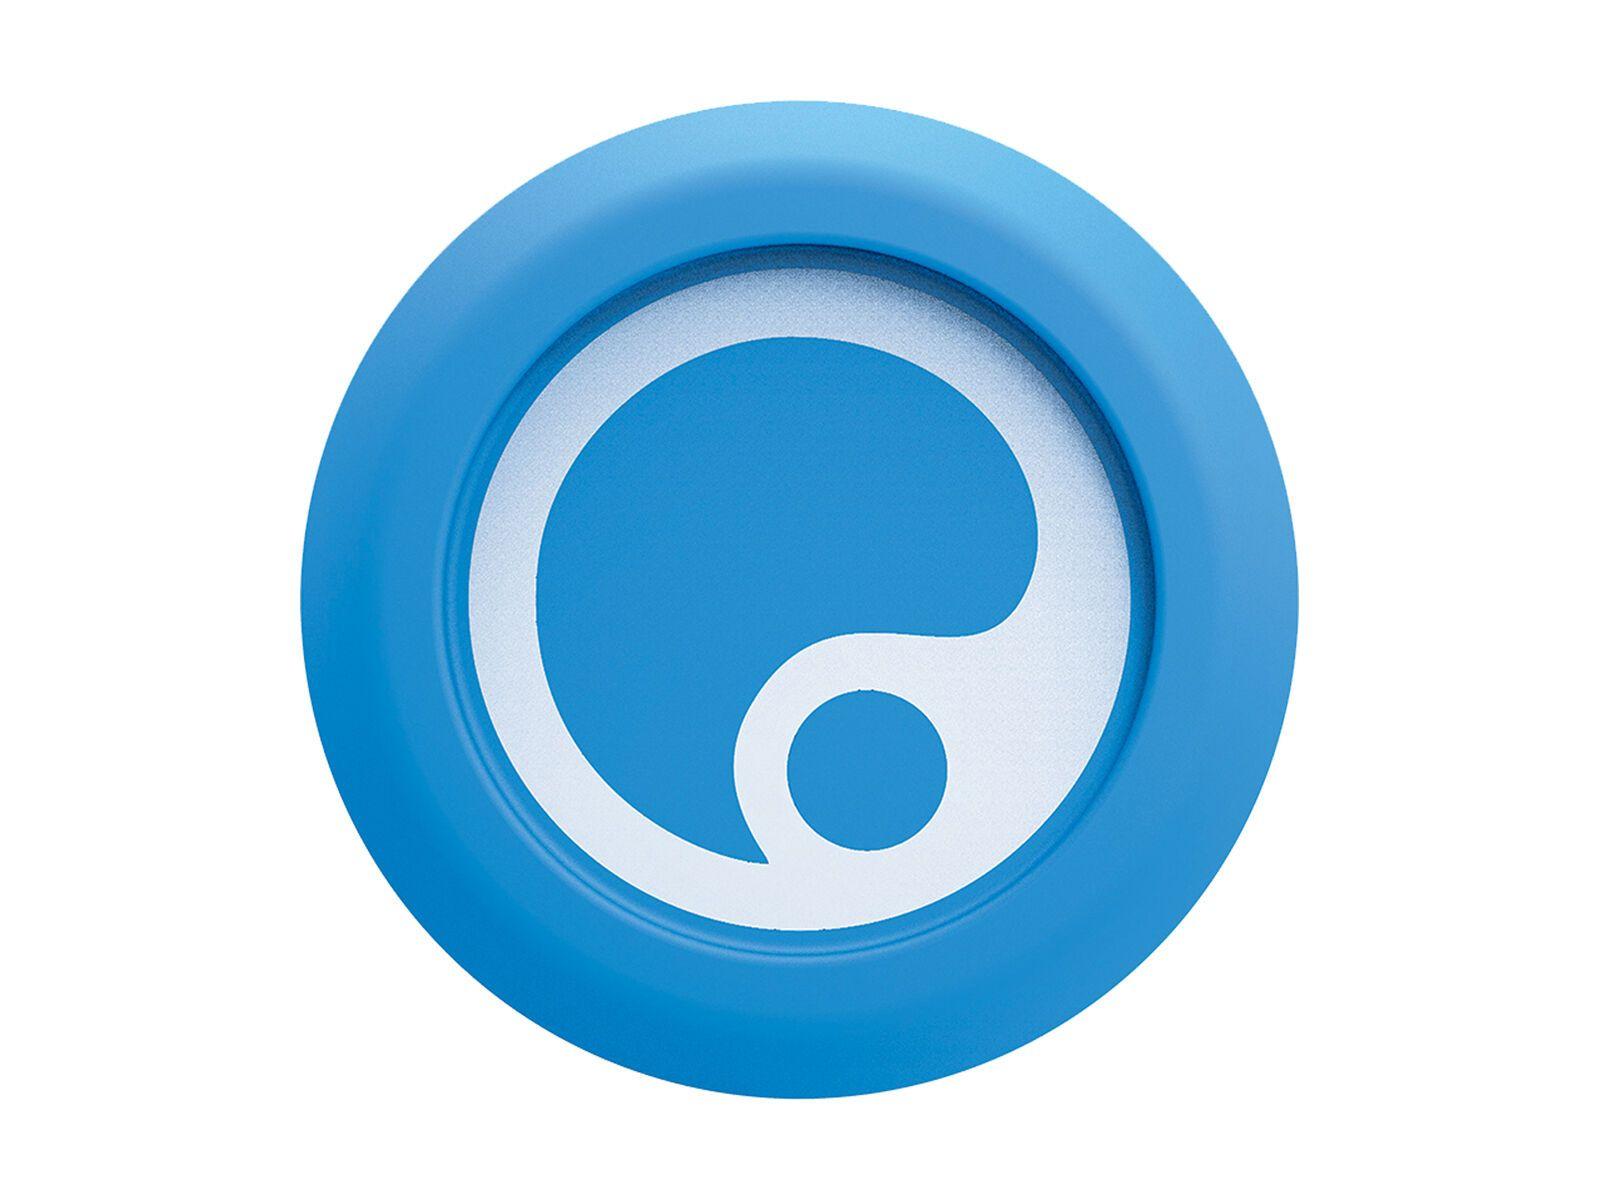 Ergon GD1 Endplug, blue - Lenkerstopfen 42480044